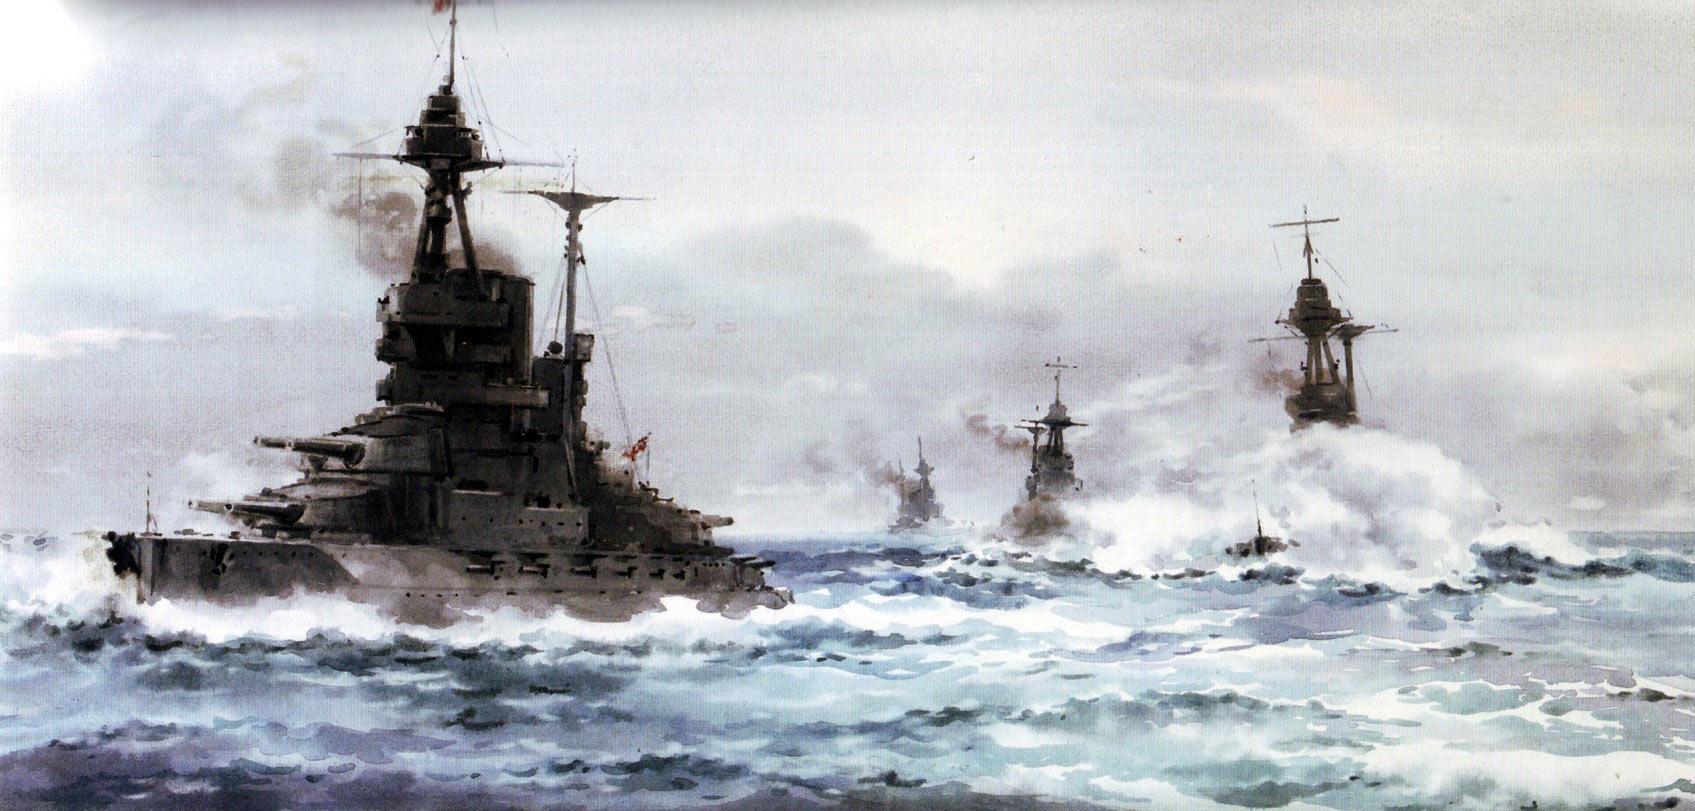 British 5th Battle Squadron Vice-Admiral Evan-Thomas's Flagship HMS Barham HMS Valiant HMS Malaya and HMS Warspite all Queen Elizabeth Class Battleships